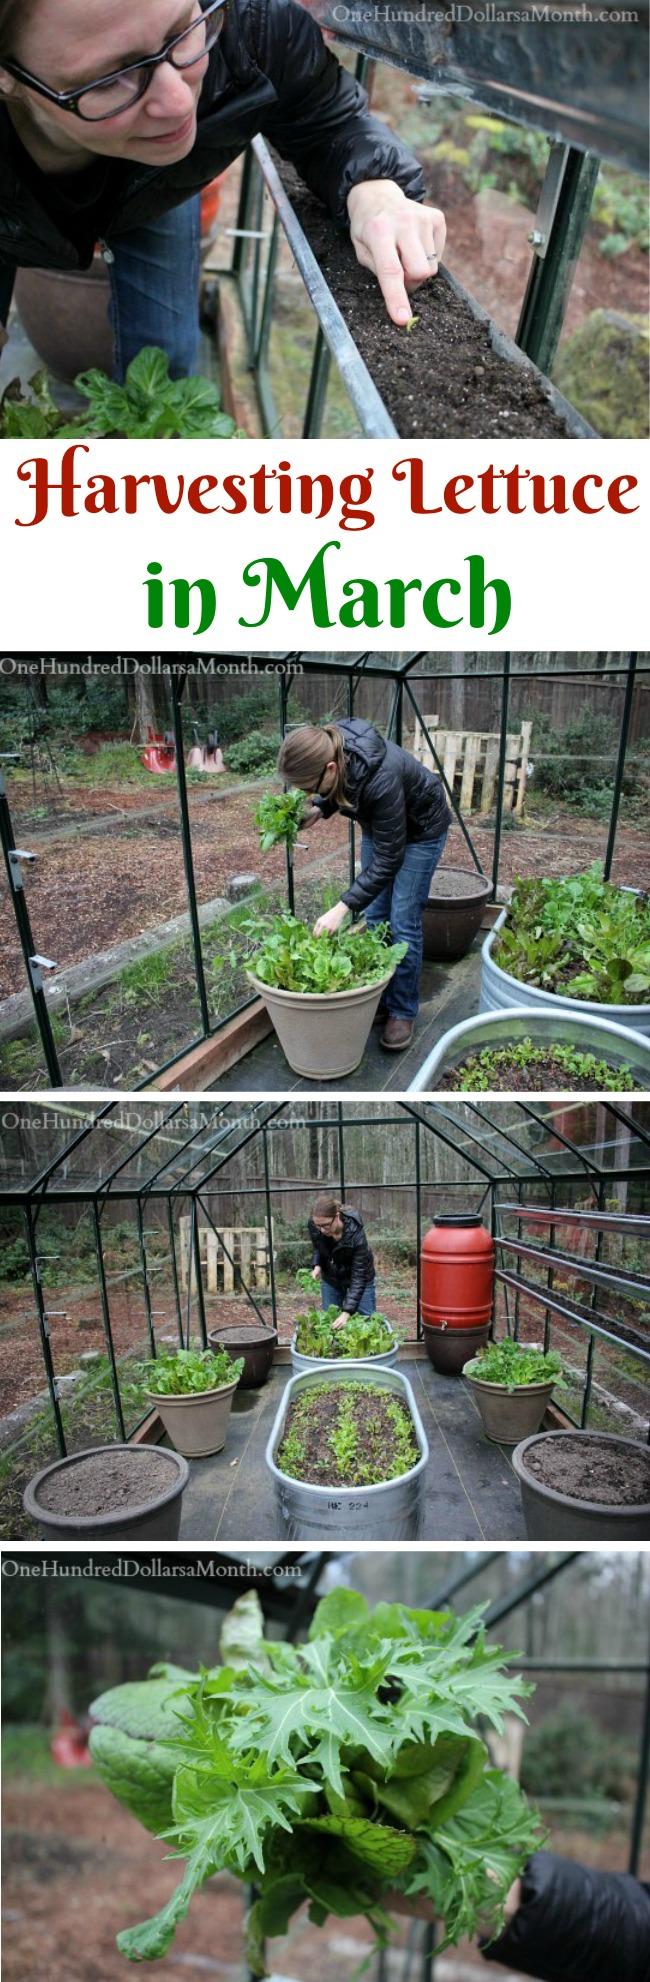 Mavis Garden Blog – Harvesting Lettuce in March